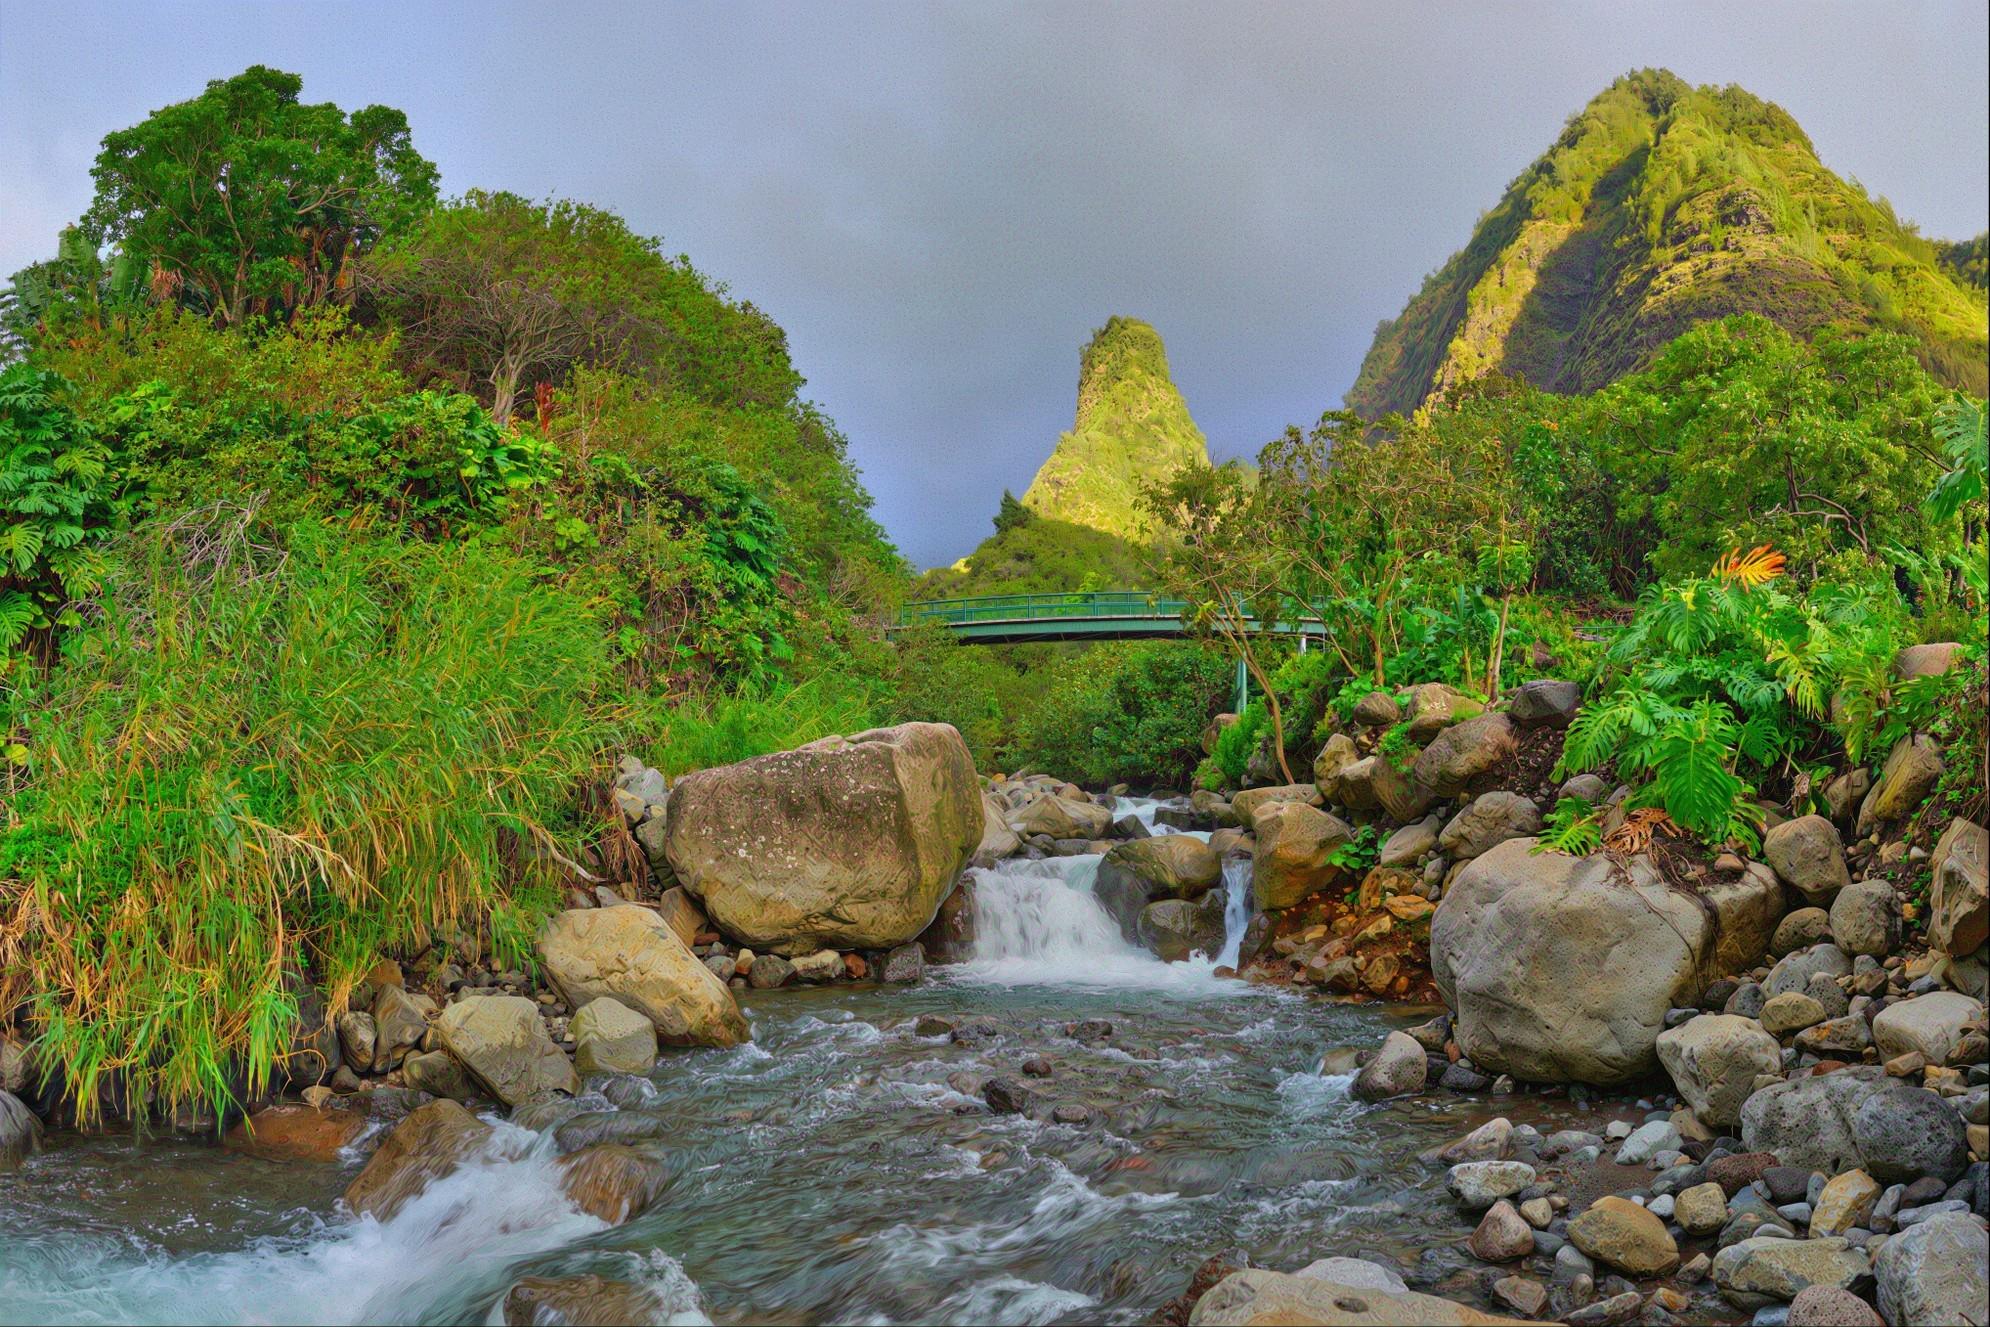 Dreamscape: The Needle (Iao Valley) #4, Maui, HI